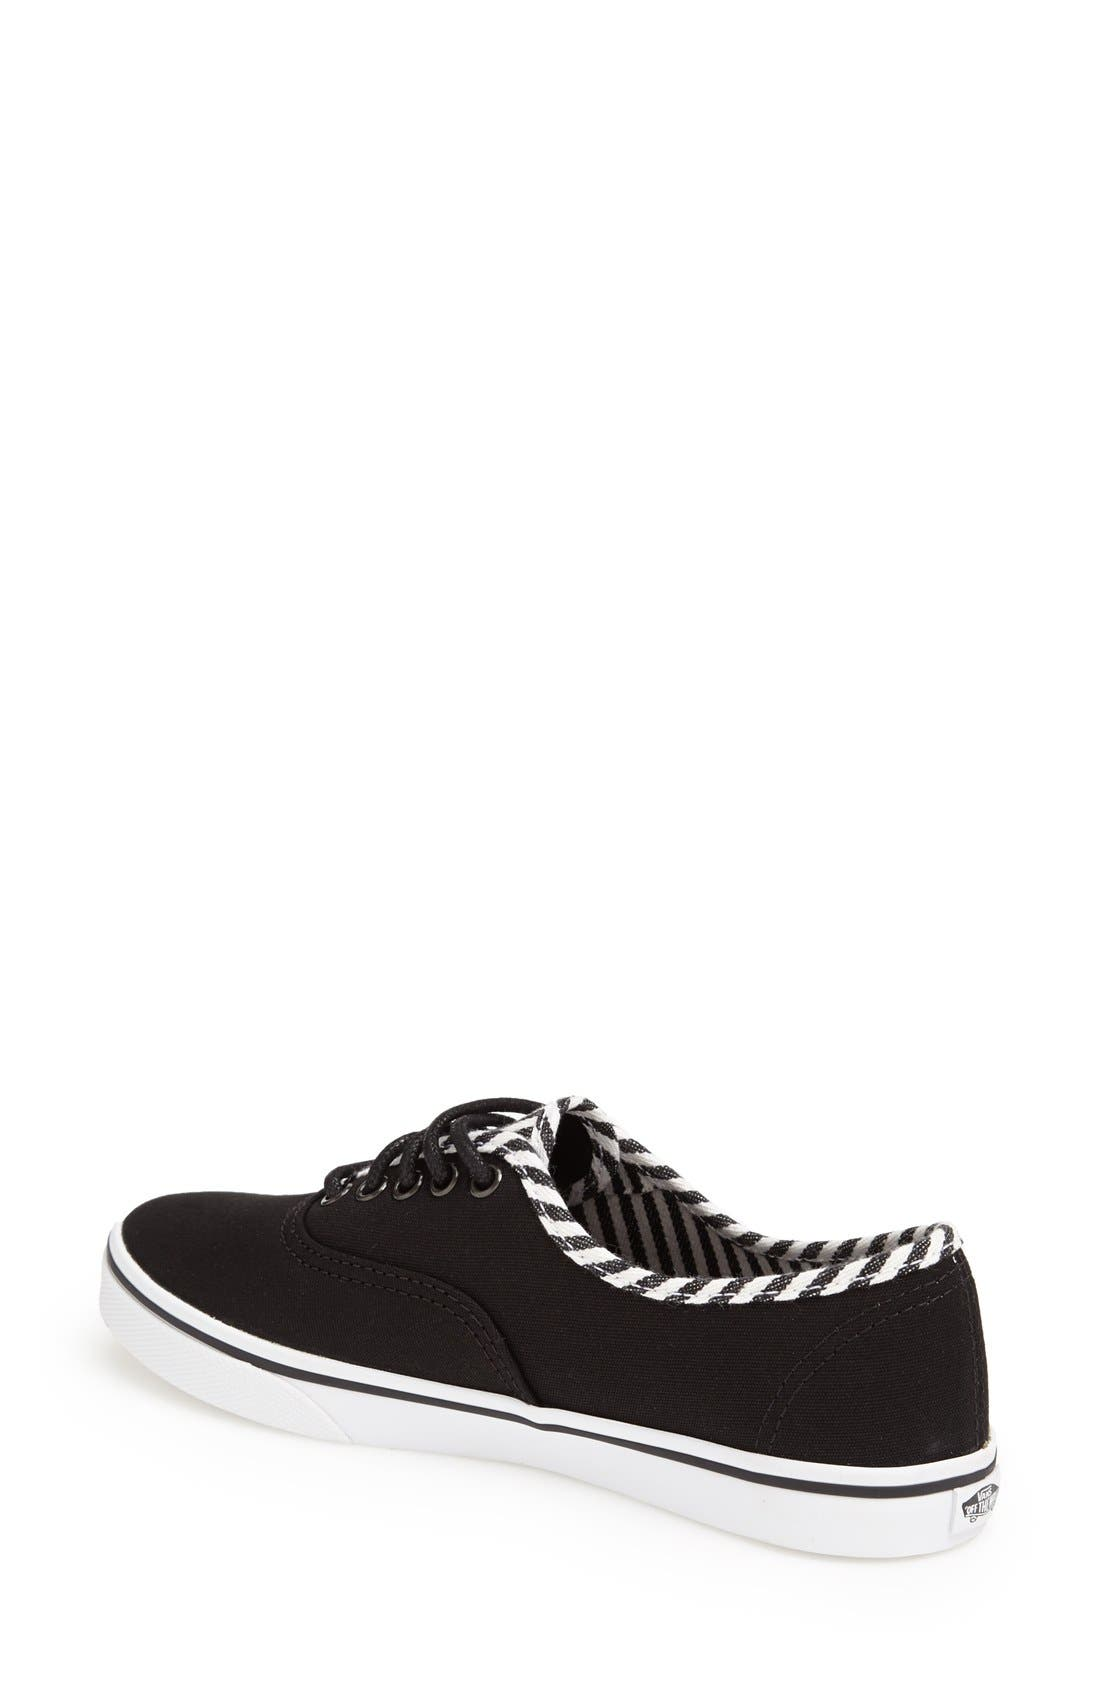 Alternate Image 2  - Vans 'Authentic - Lo Pro Hickory Stripes' Sneaker (Women)